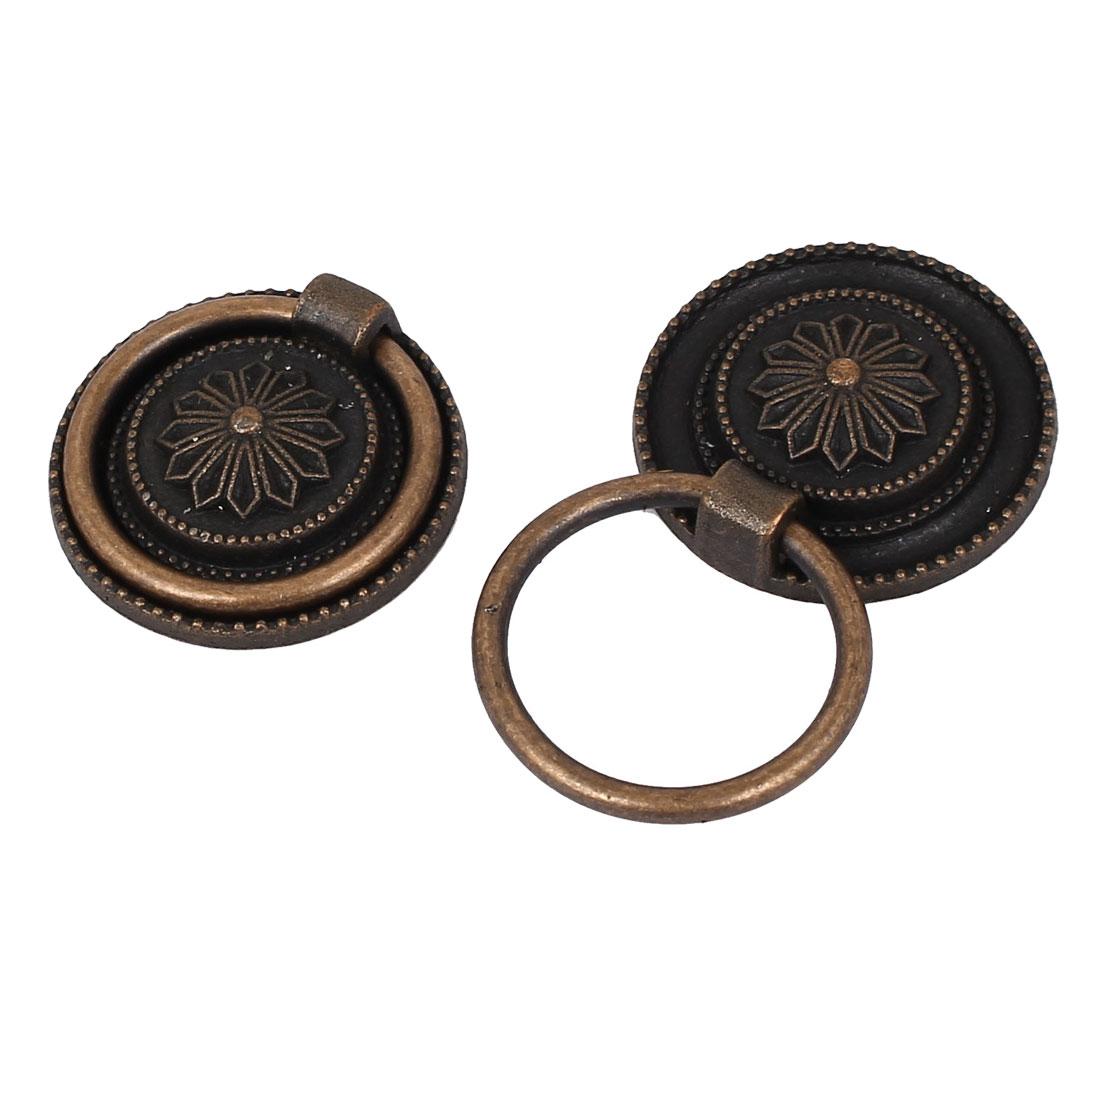 Cabinet Drawer Door Metal 3cm Diameter Round Ring Pull Handles 2pcs